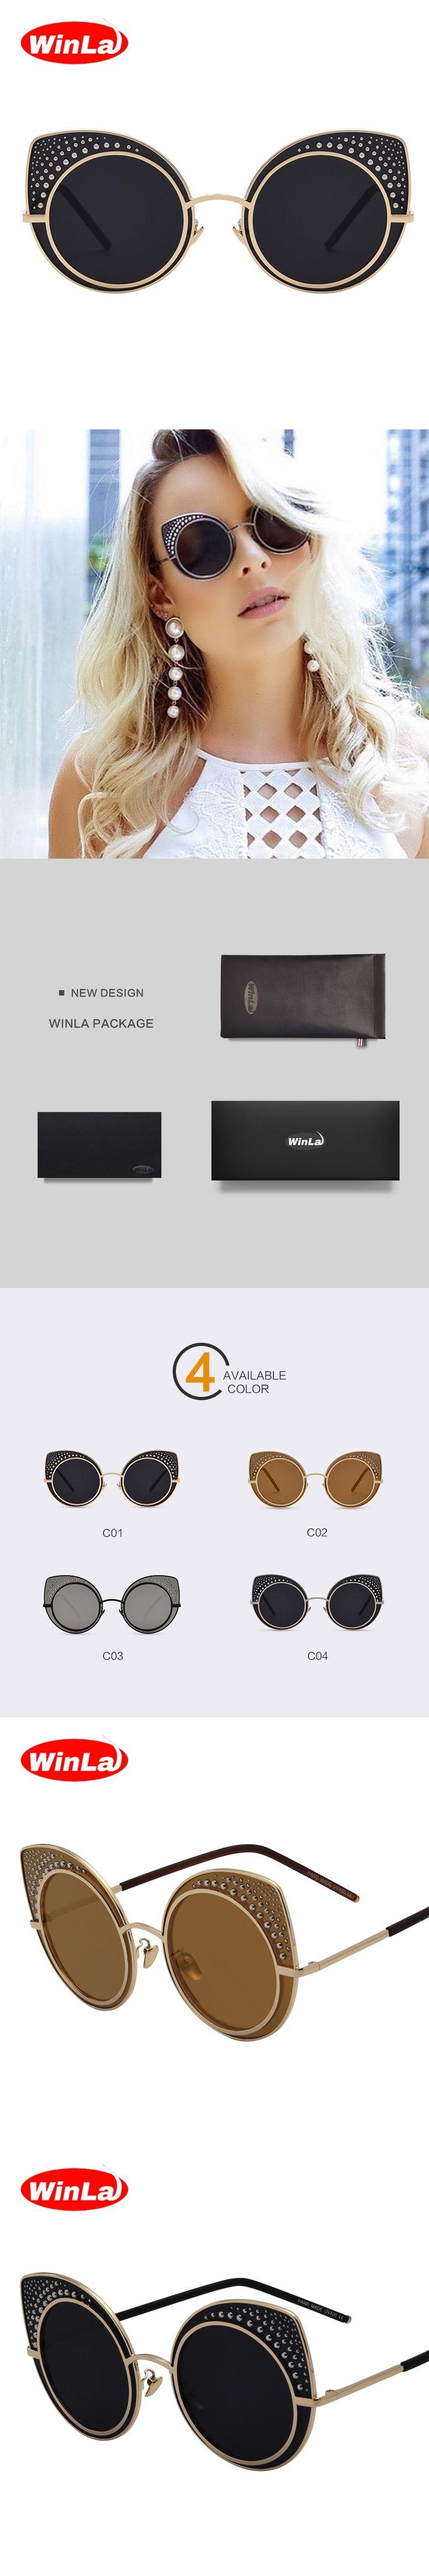 Winla Fashion Cat Eye Sunglasses Women Classic Brand Designer Vintage Coating Sunglasses Female lentes de sol mujer UV400 WL1045